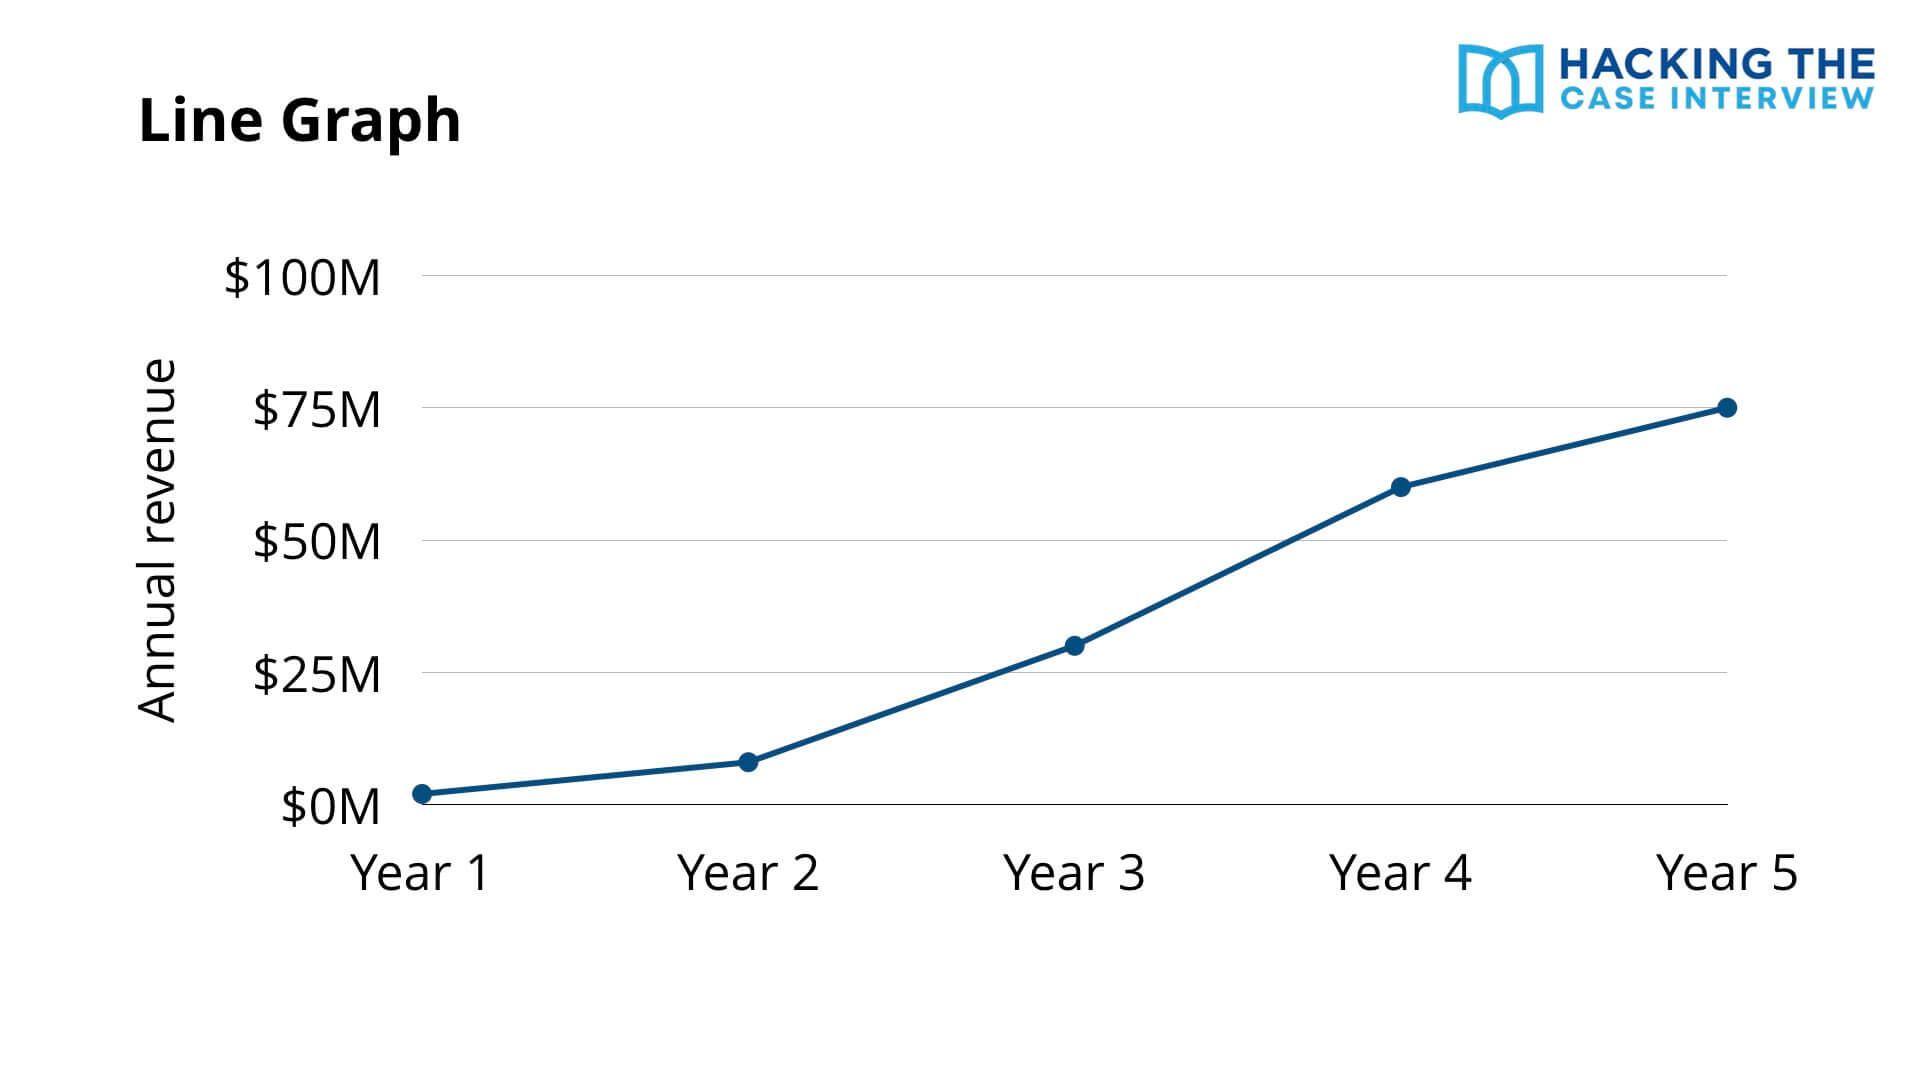 Case Interview Line Graph